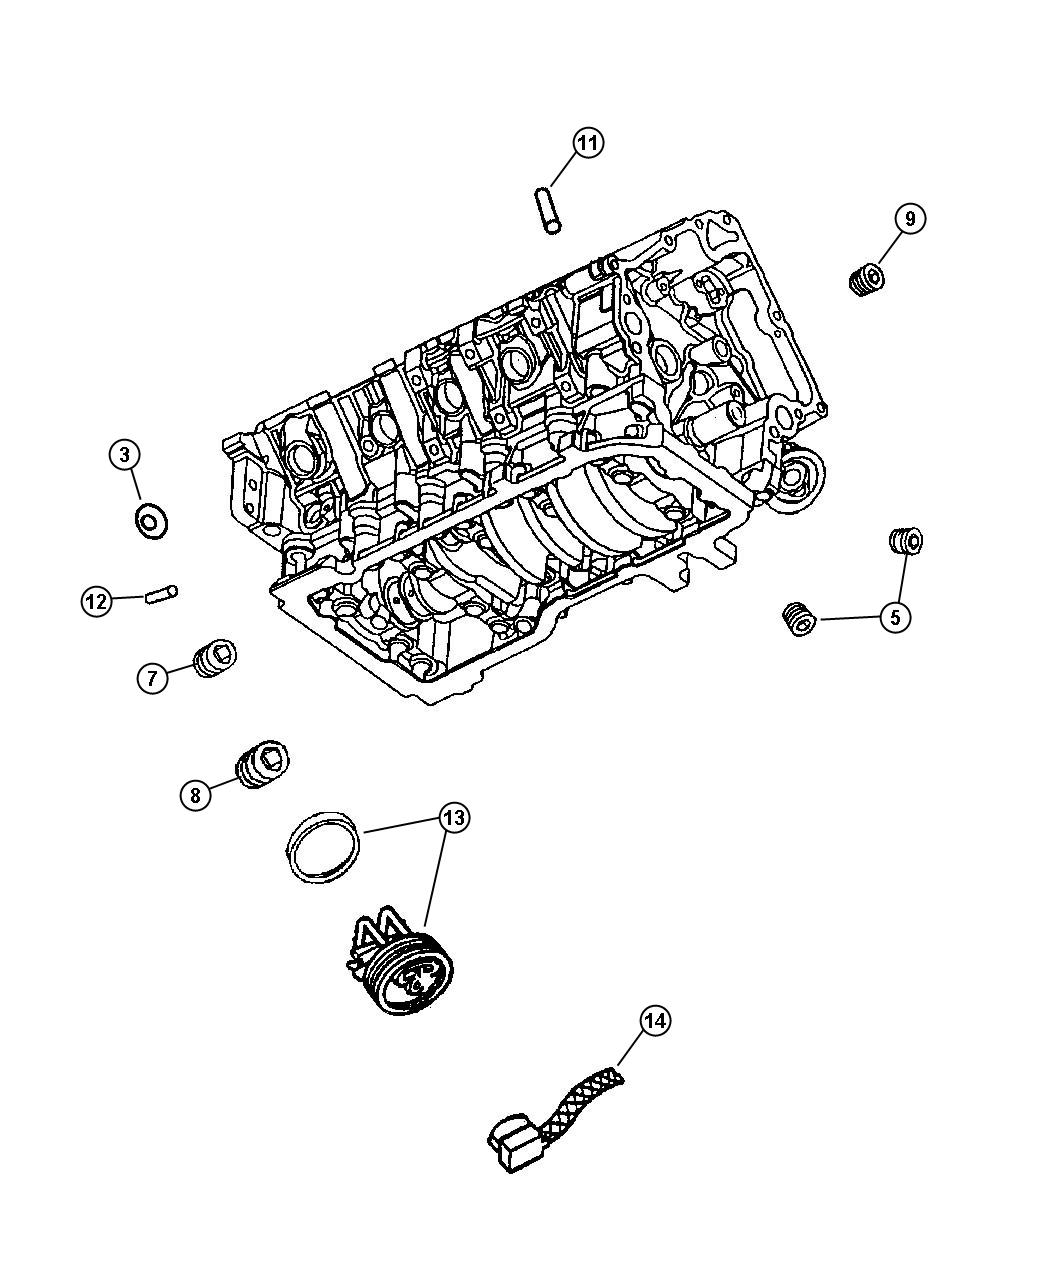 Chrysler 300 Cord Engine Block Heater For 5 7l